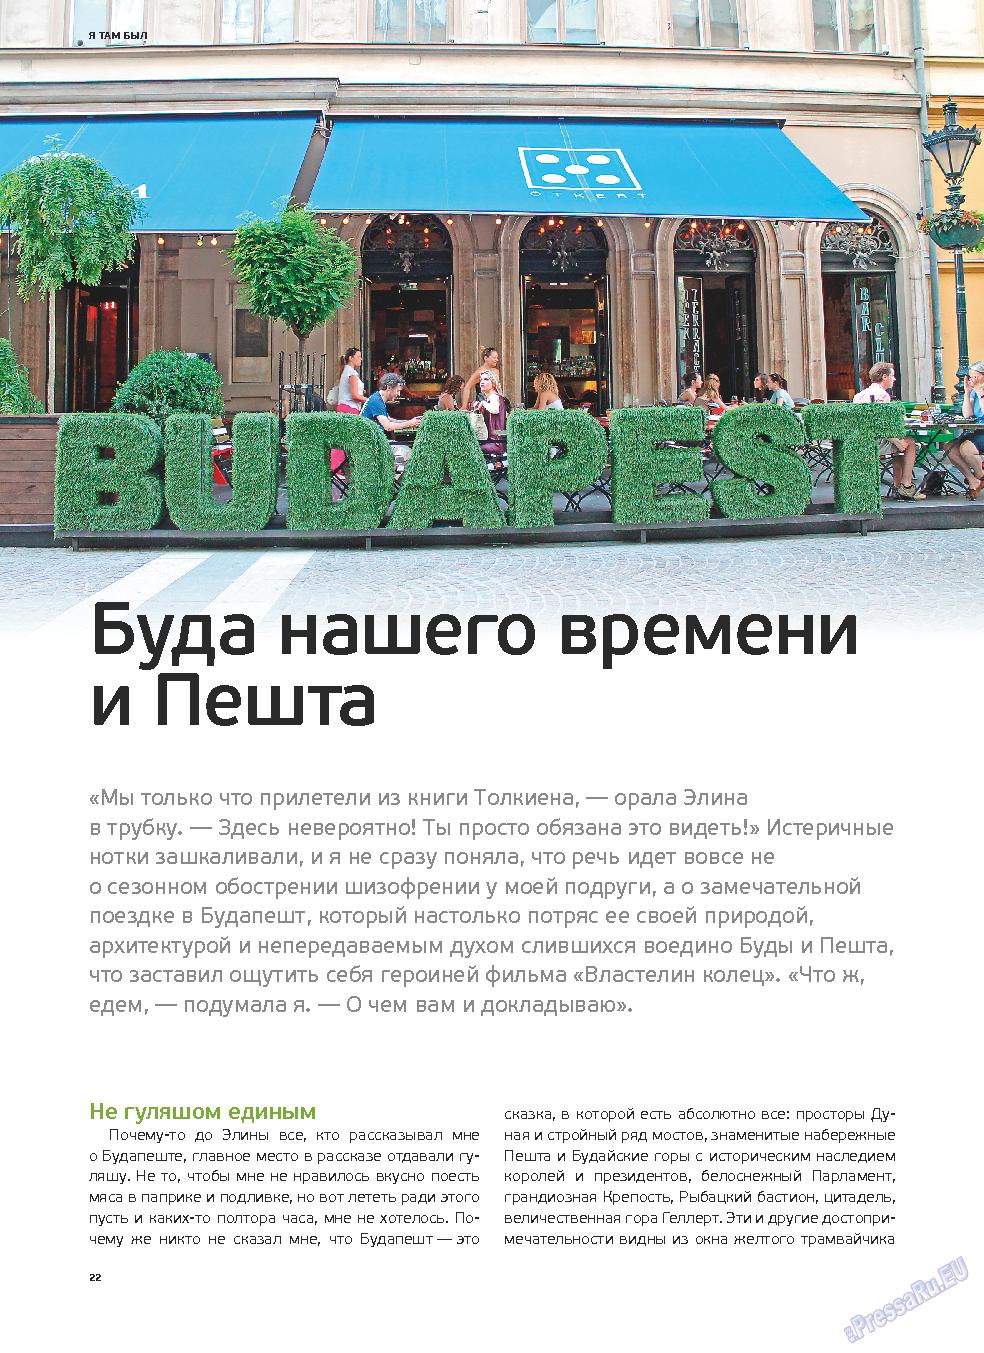 Артек (журнал). 2013 год, номер 6, стр. 24